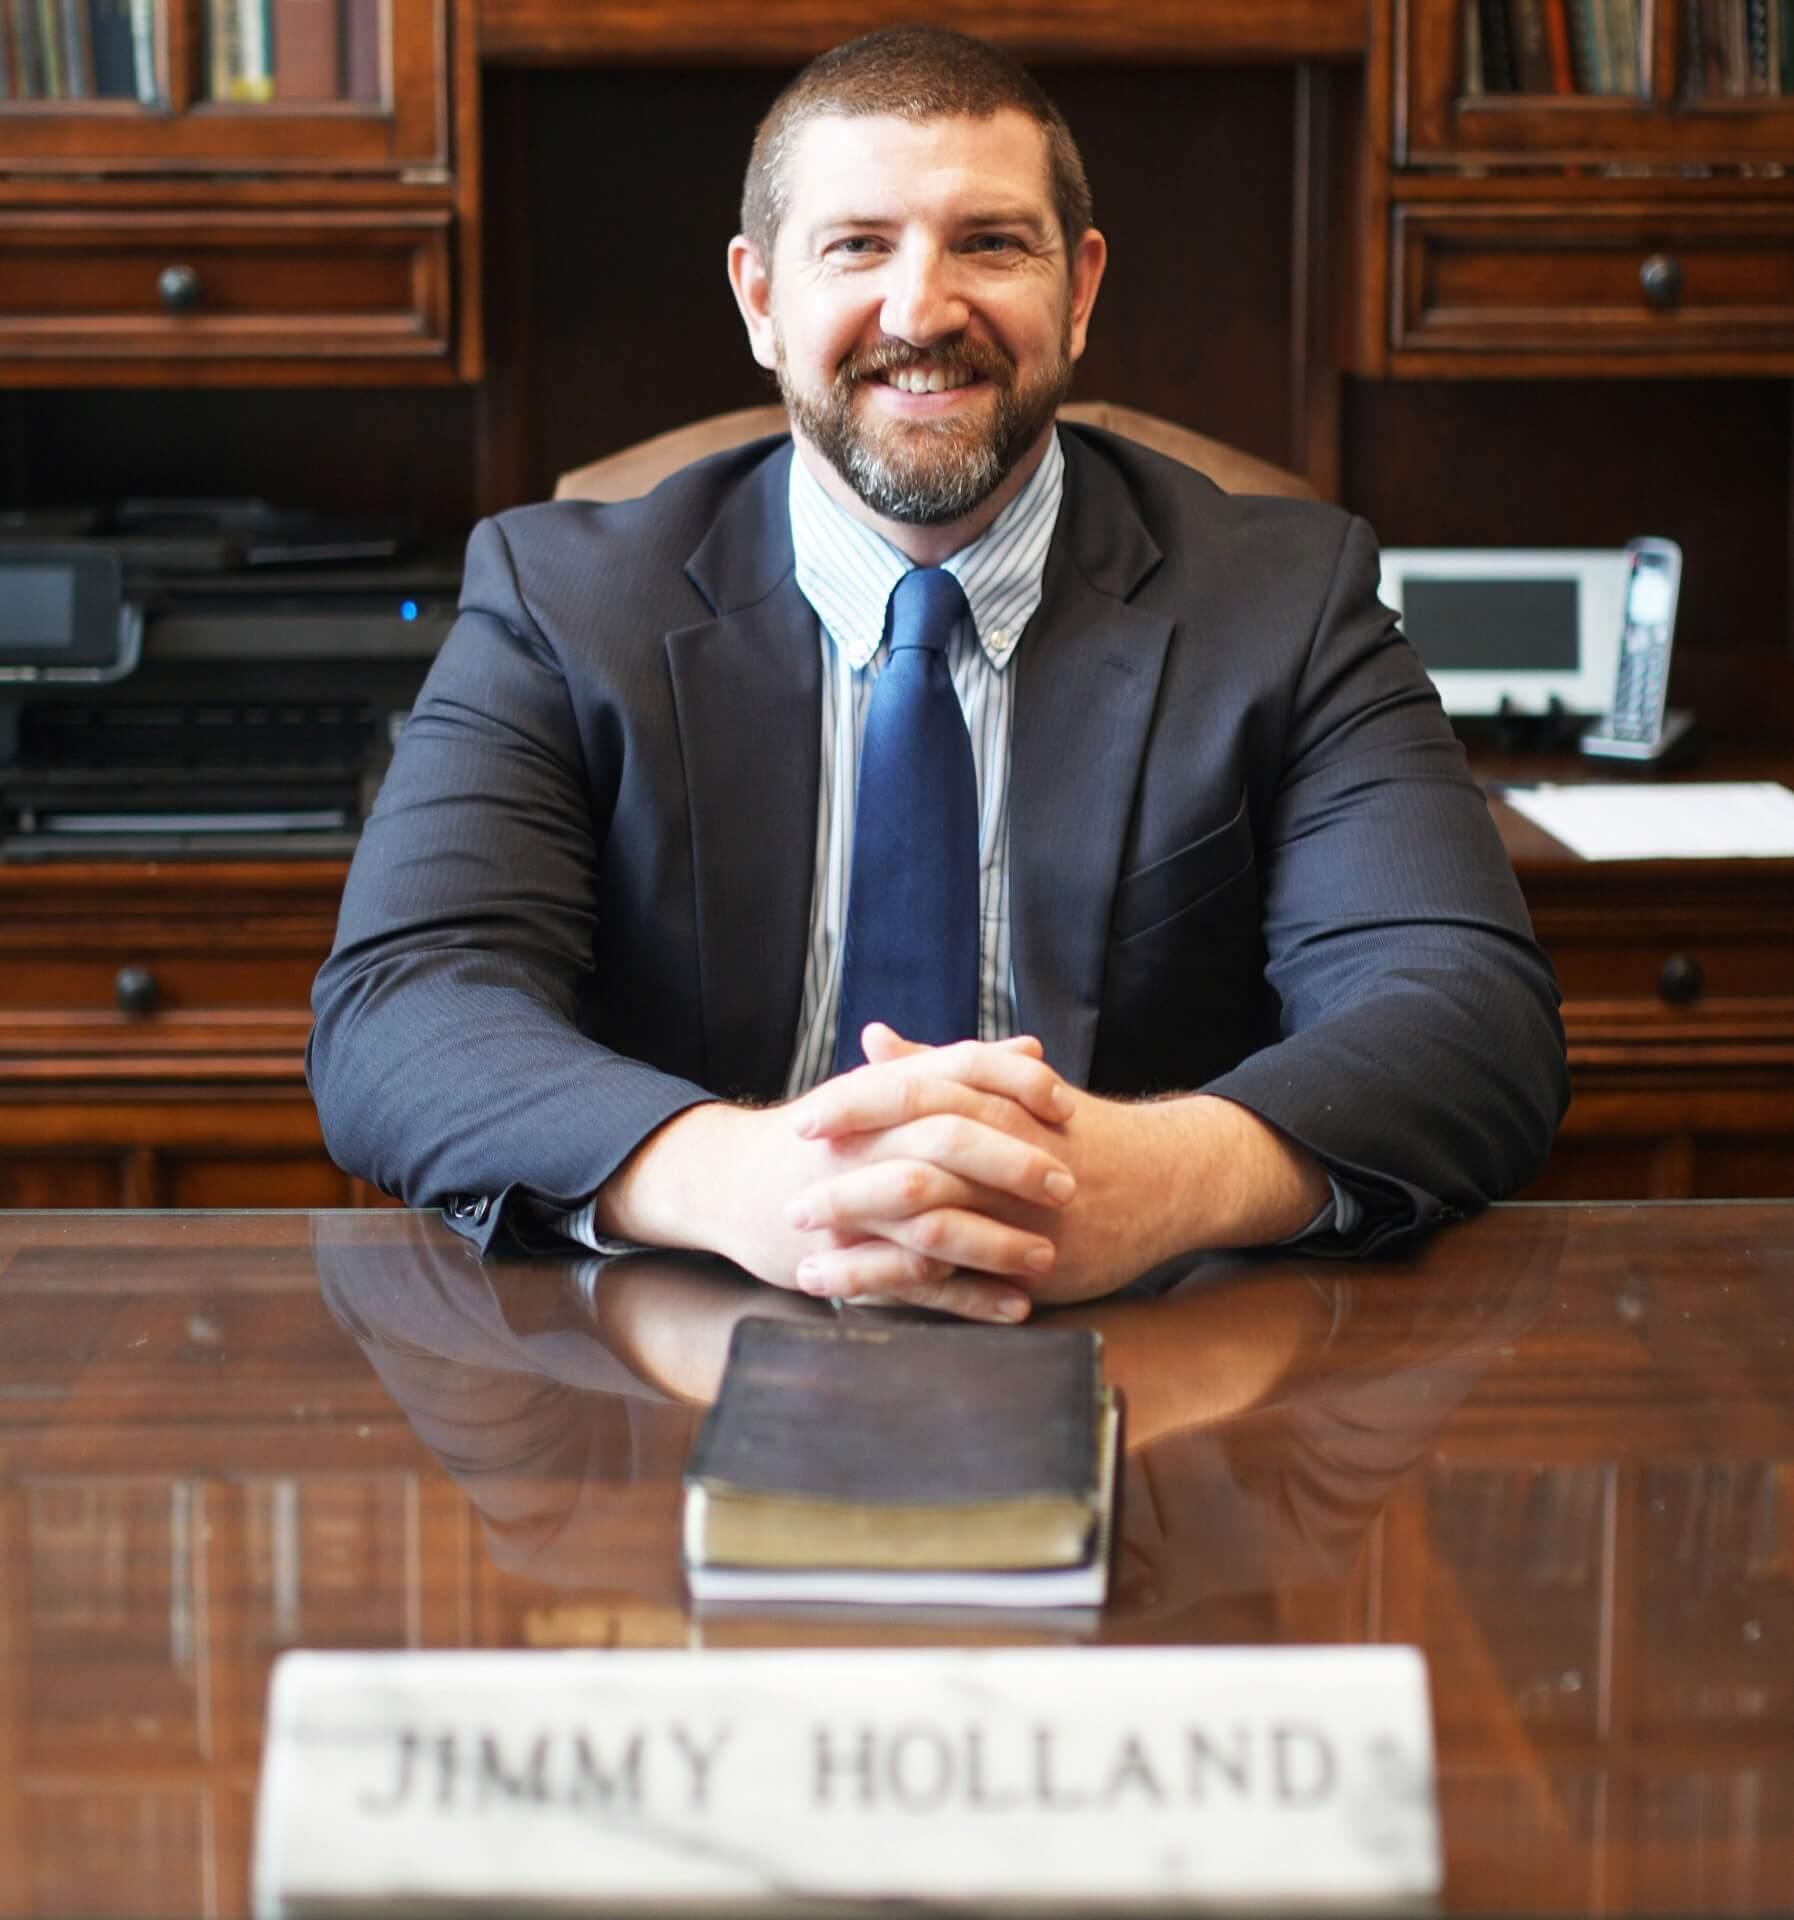 Jimmy Holland 7-2-17